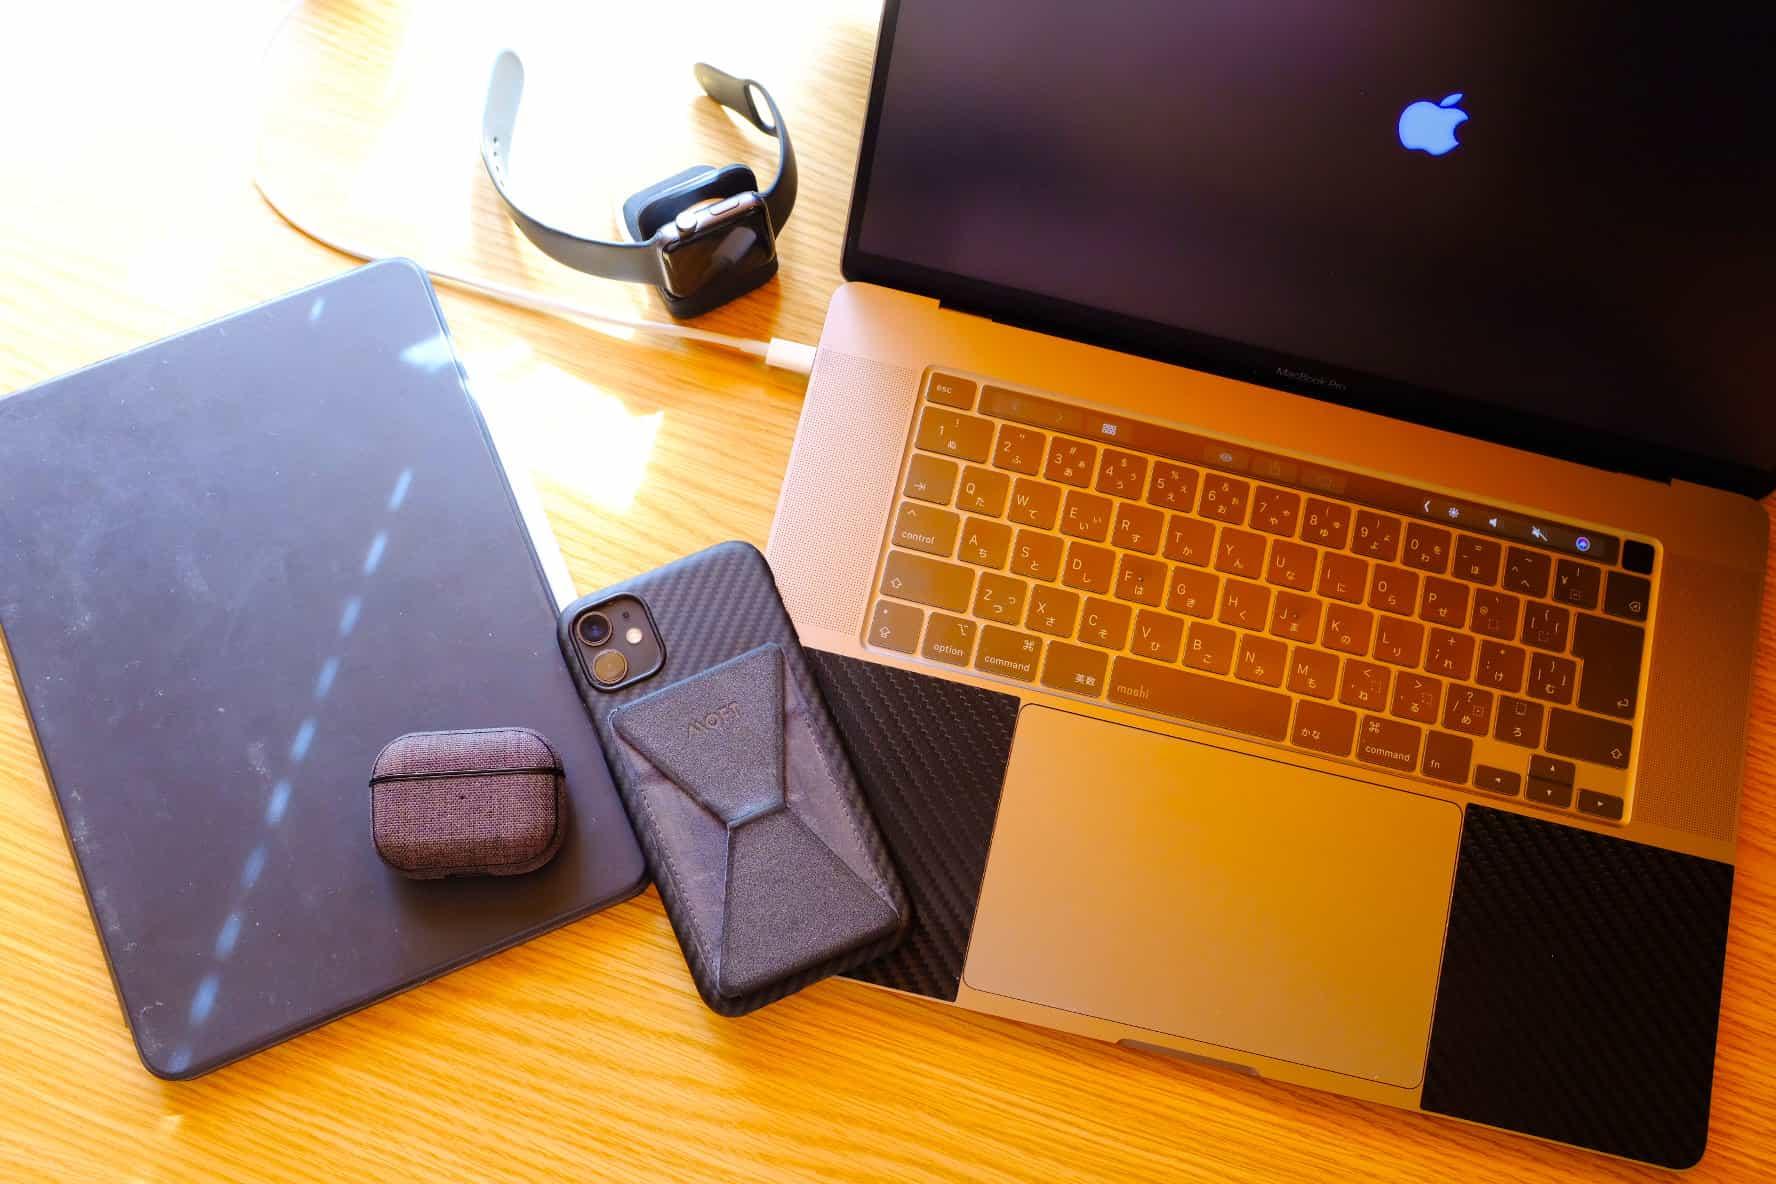 ECサイト、広告運営をこなすサラリーマンブロガーが毎日使うApple製品ベスト5!